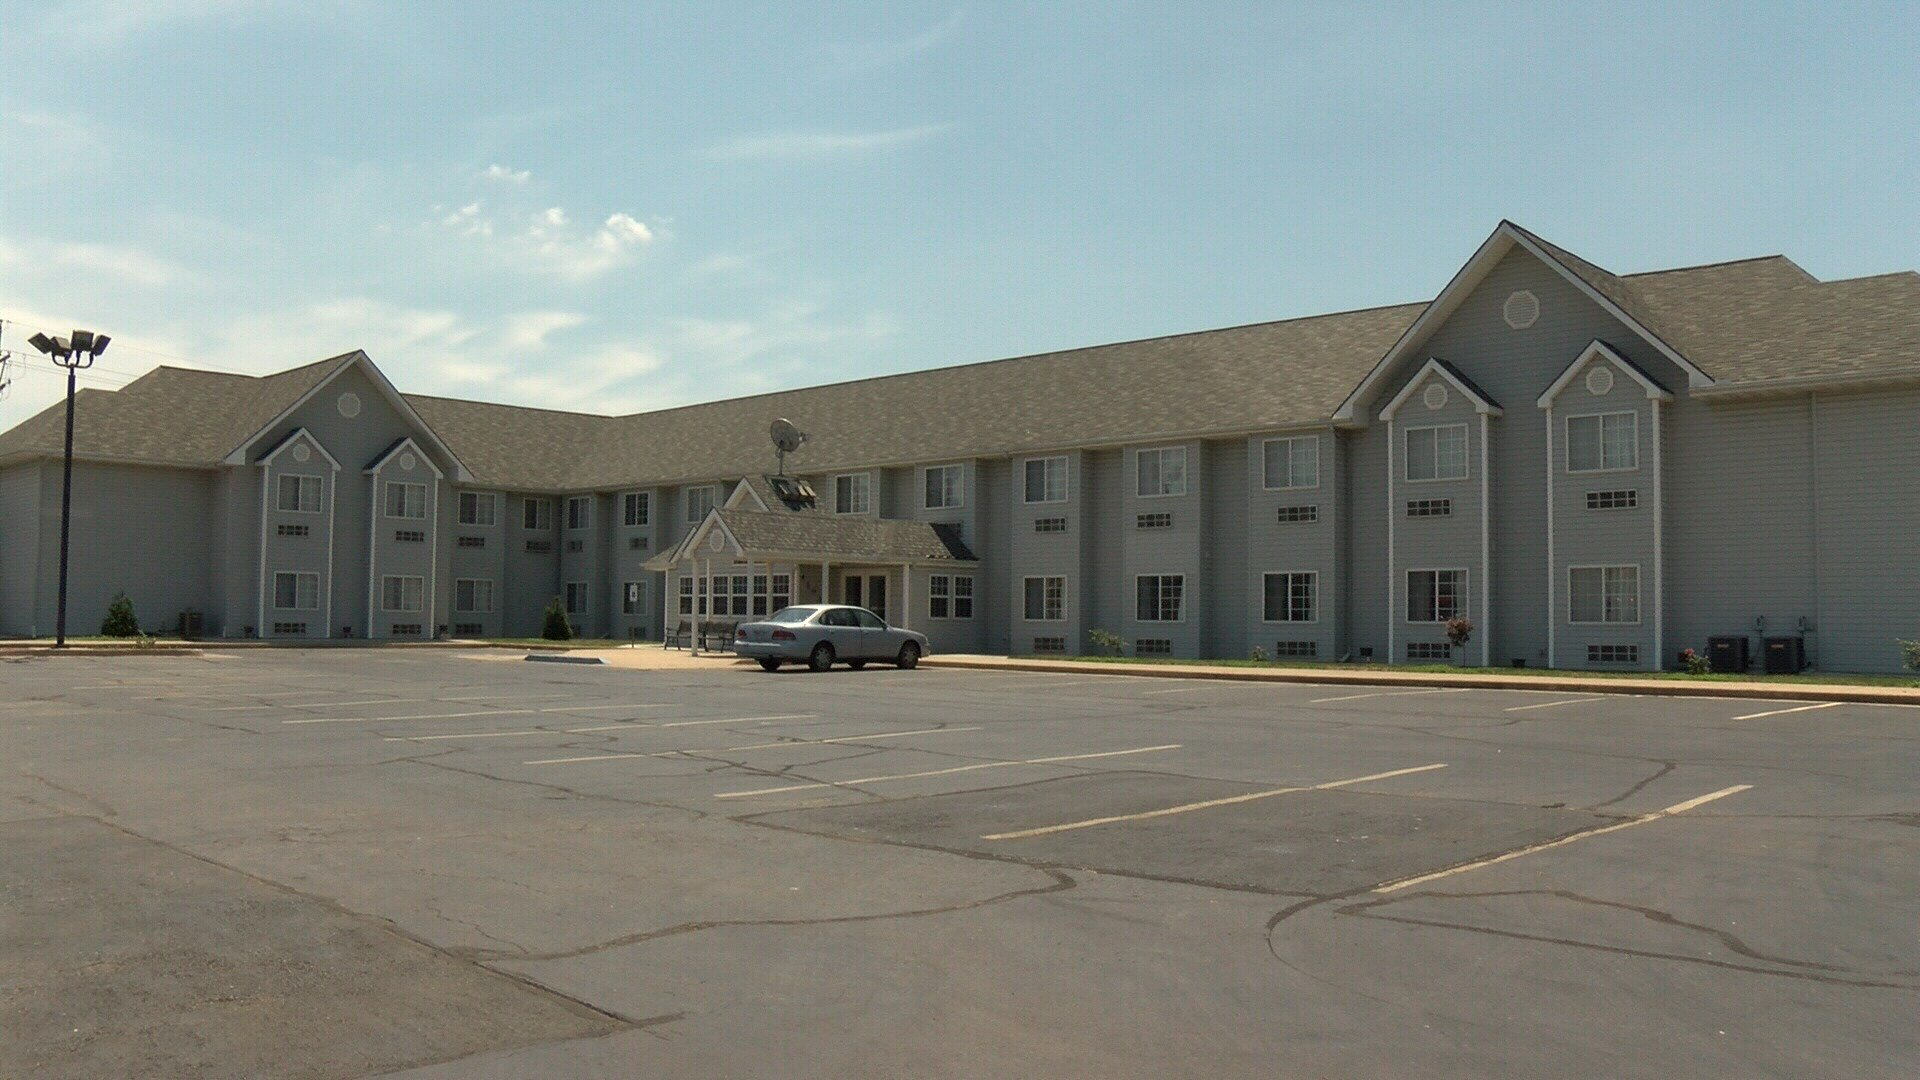 Microtel Motel in Joplin